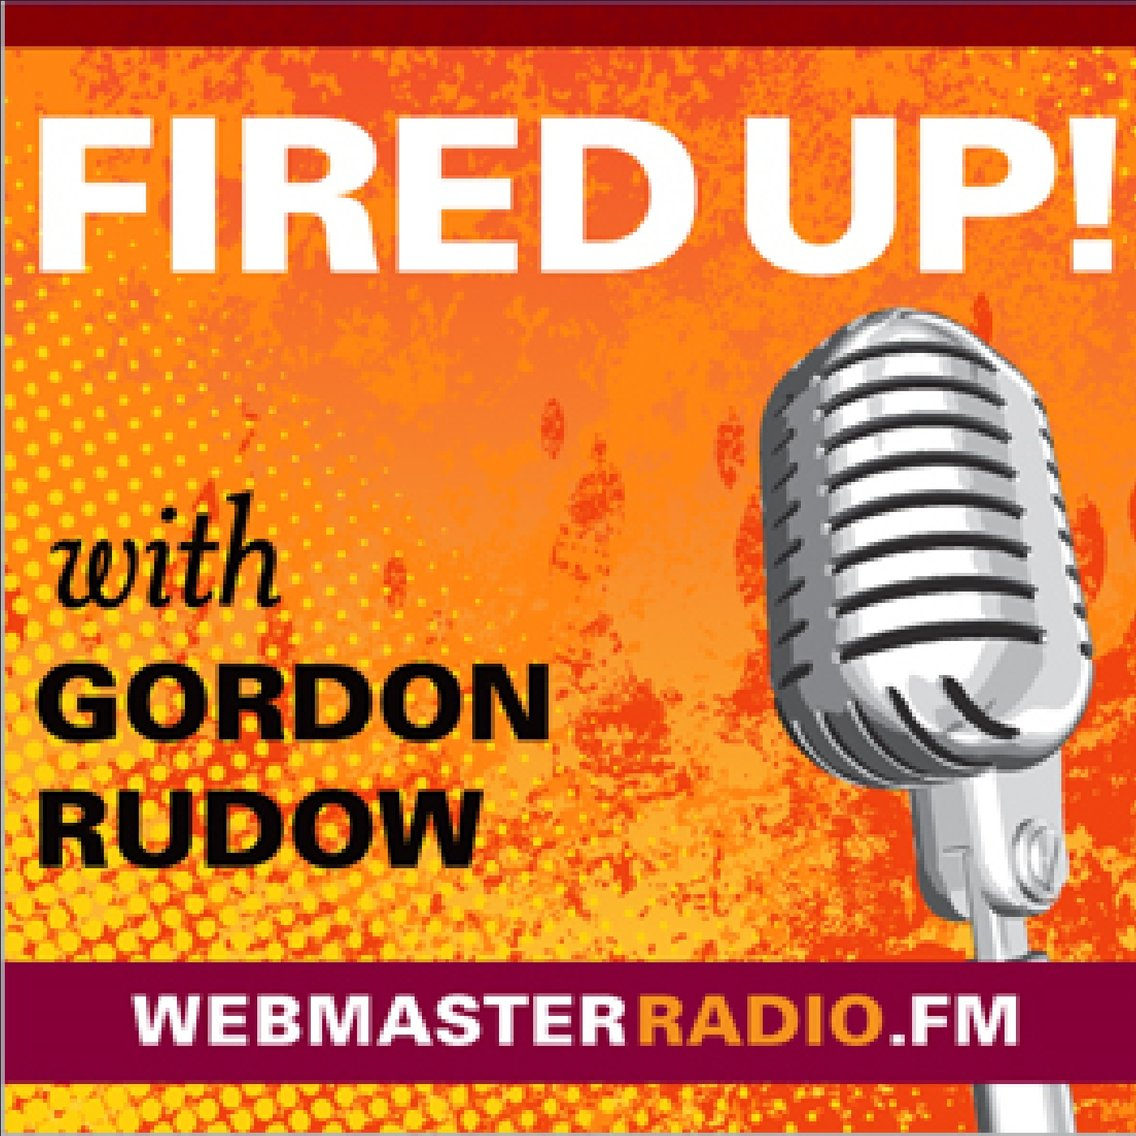 Fired Up With Gordon Rudow - imagen de portada